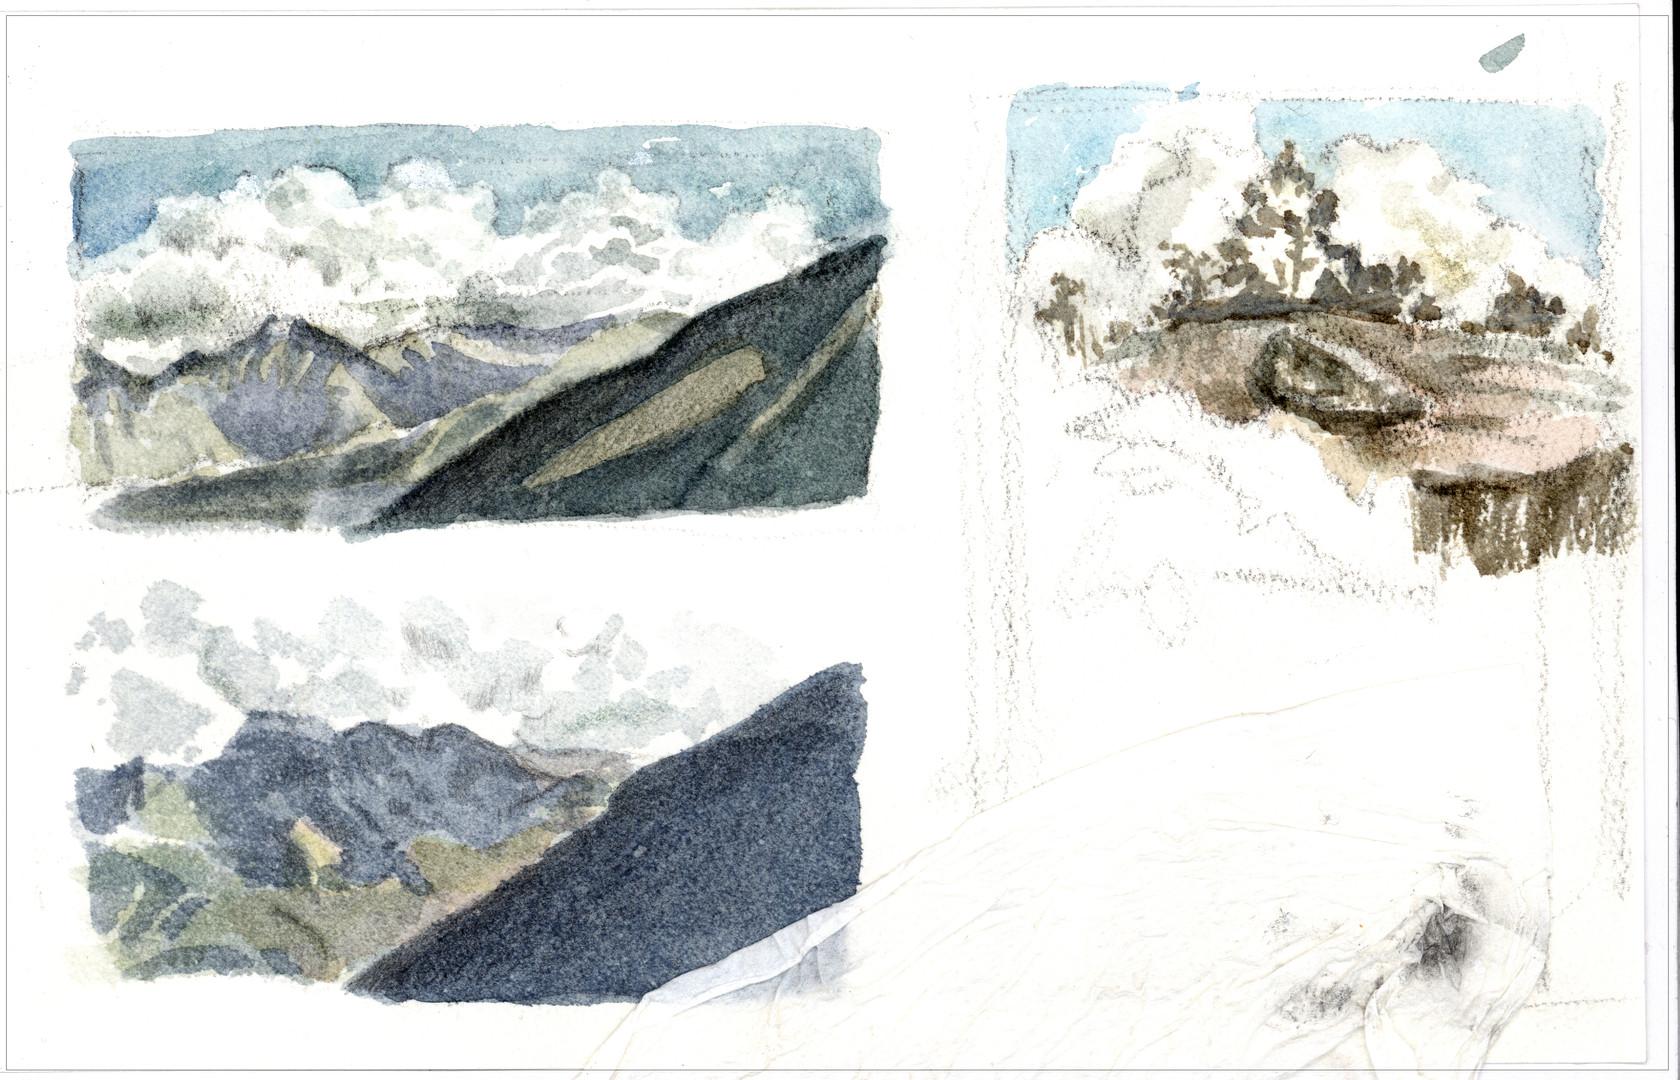 Bergwelt-skizzen Arcegno`17.jpg